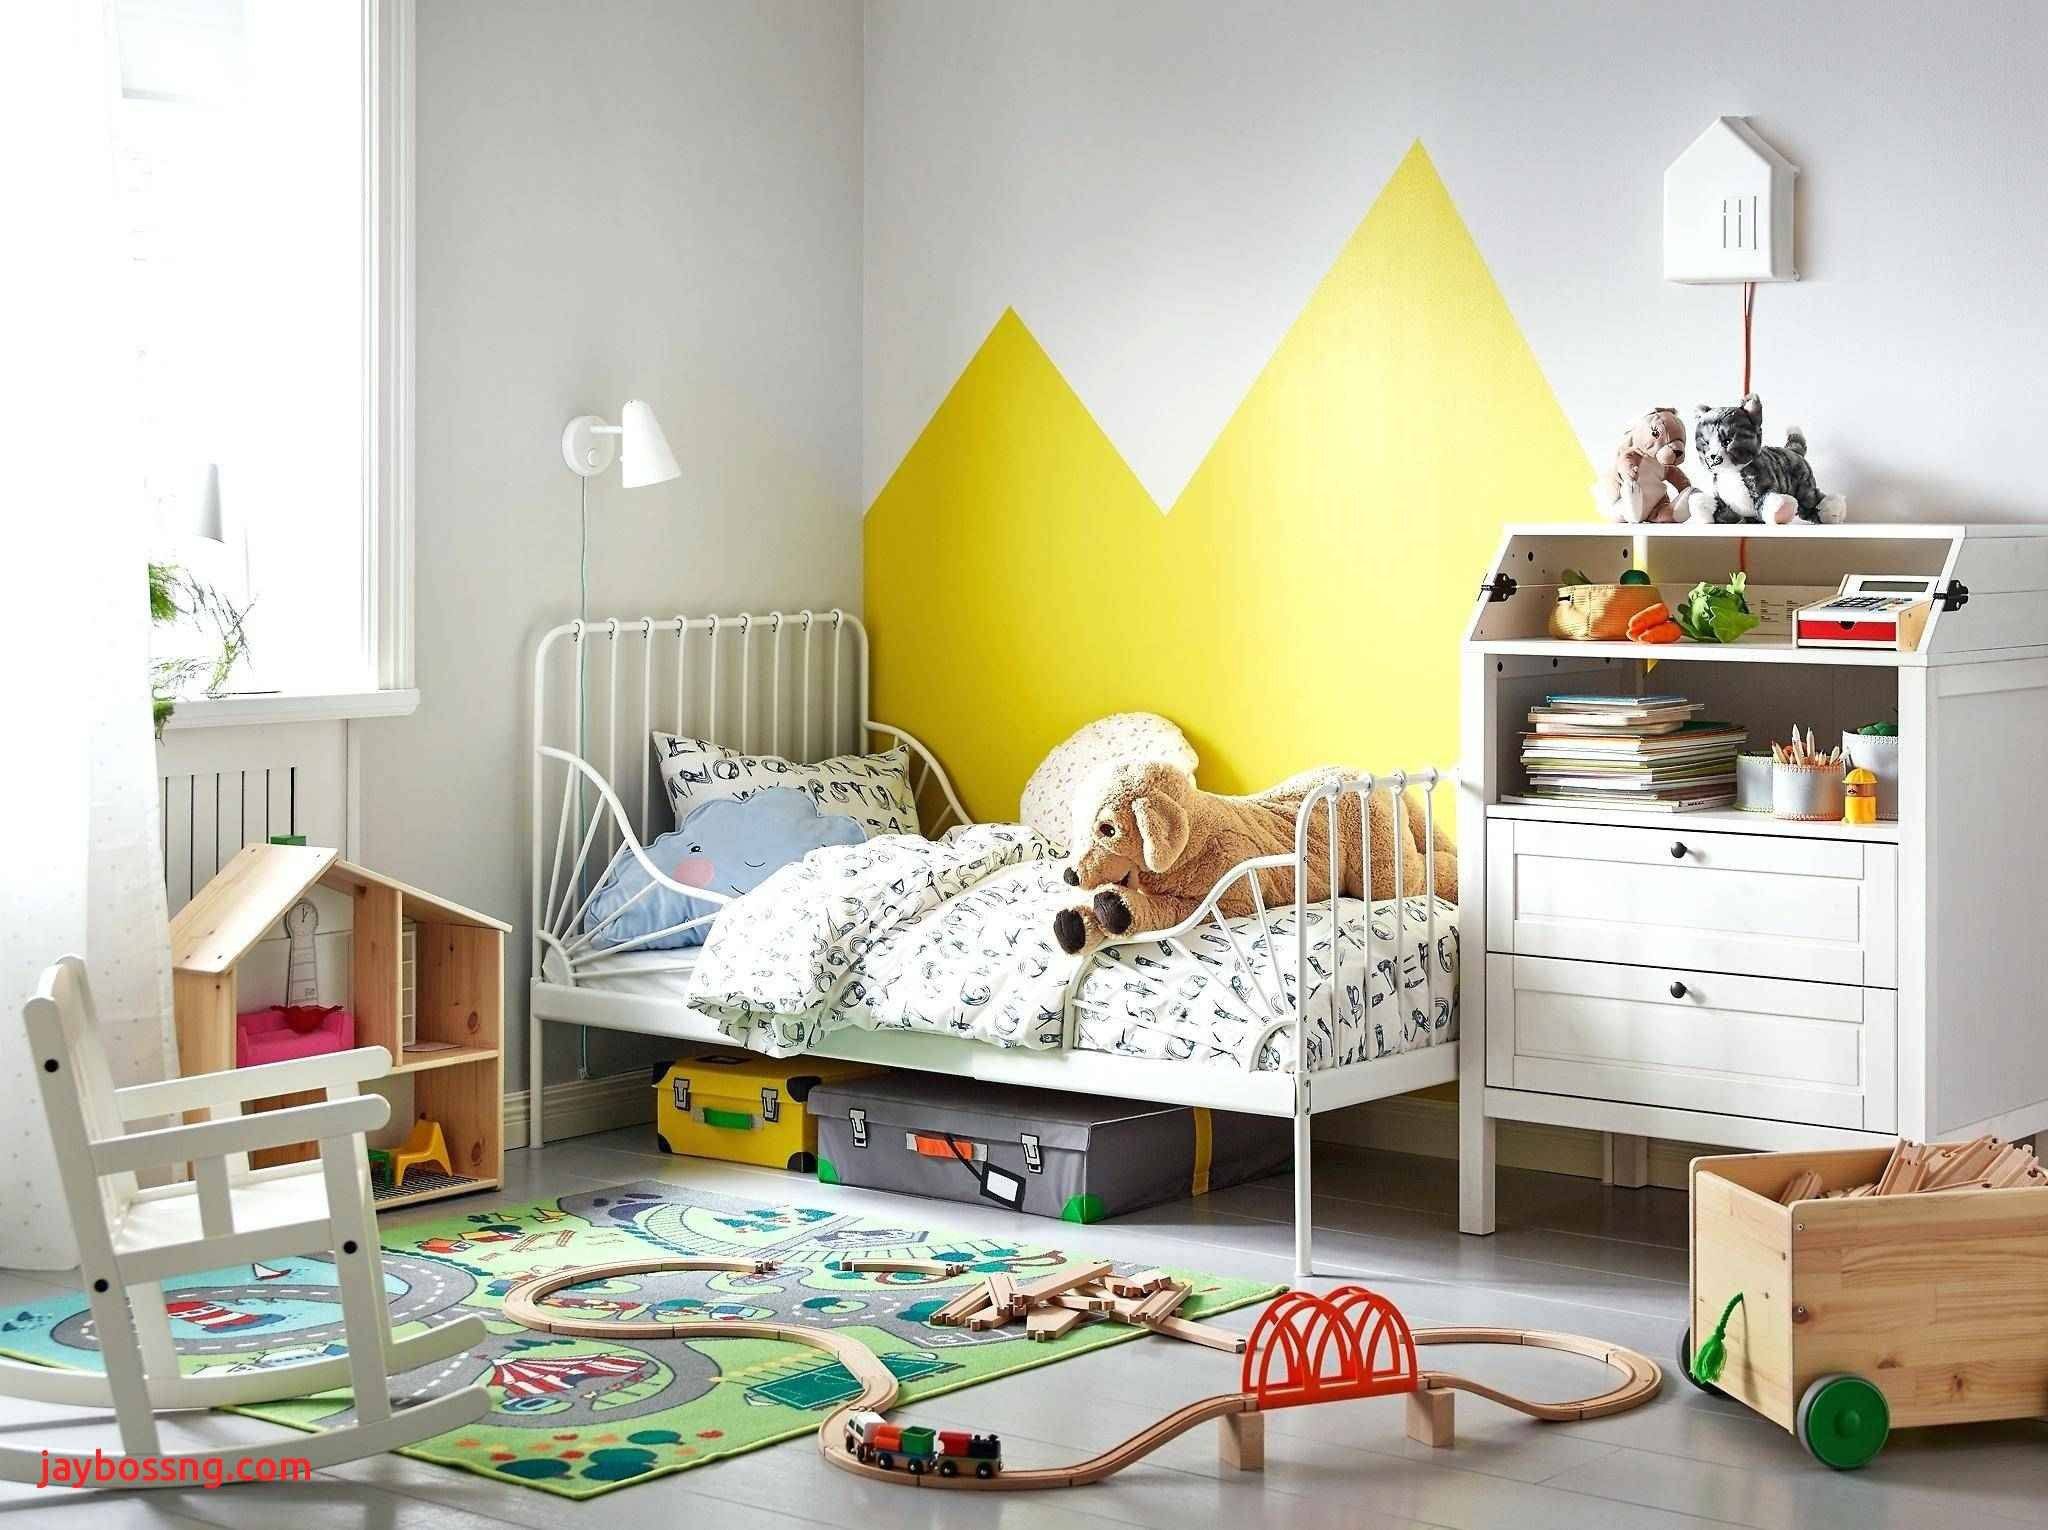 Cool Boy Bedroom Ideas Best Of 22 Lovable Yellow Vases Ikea